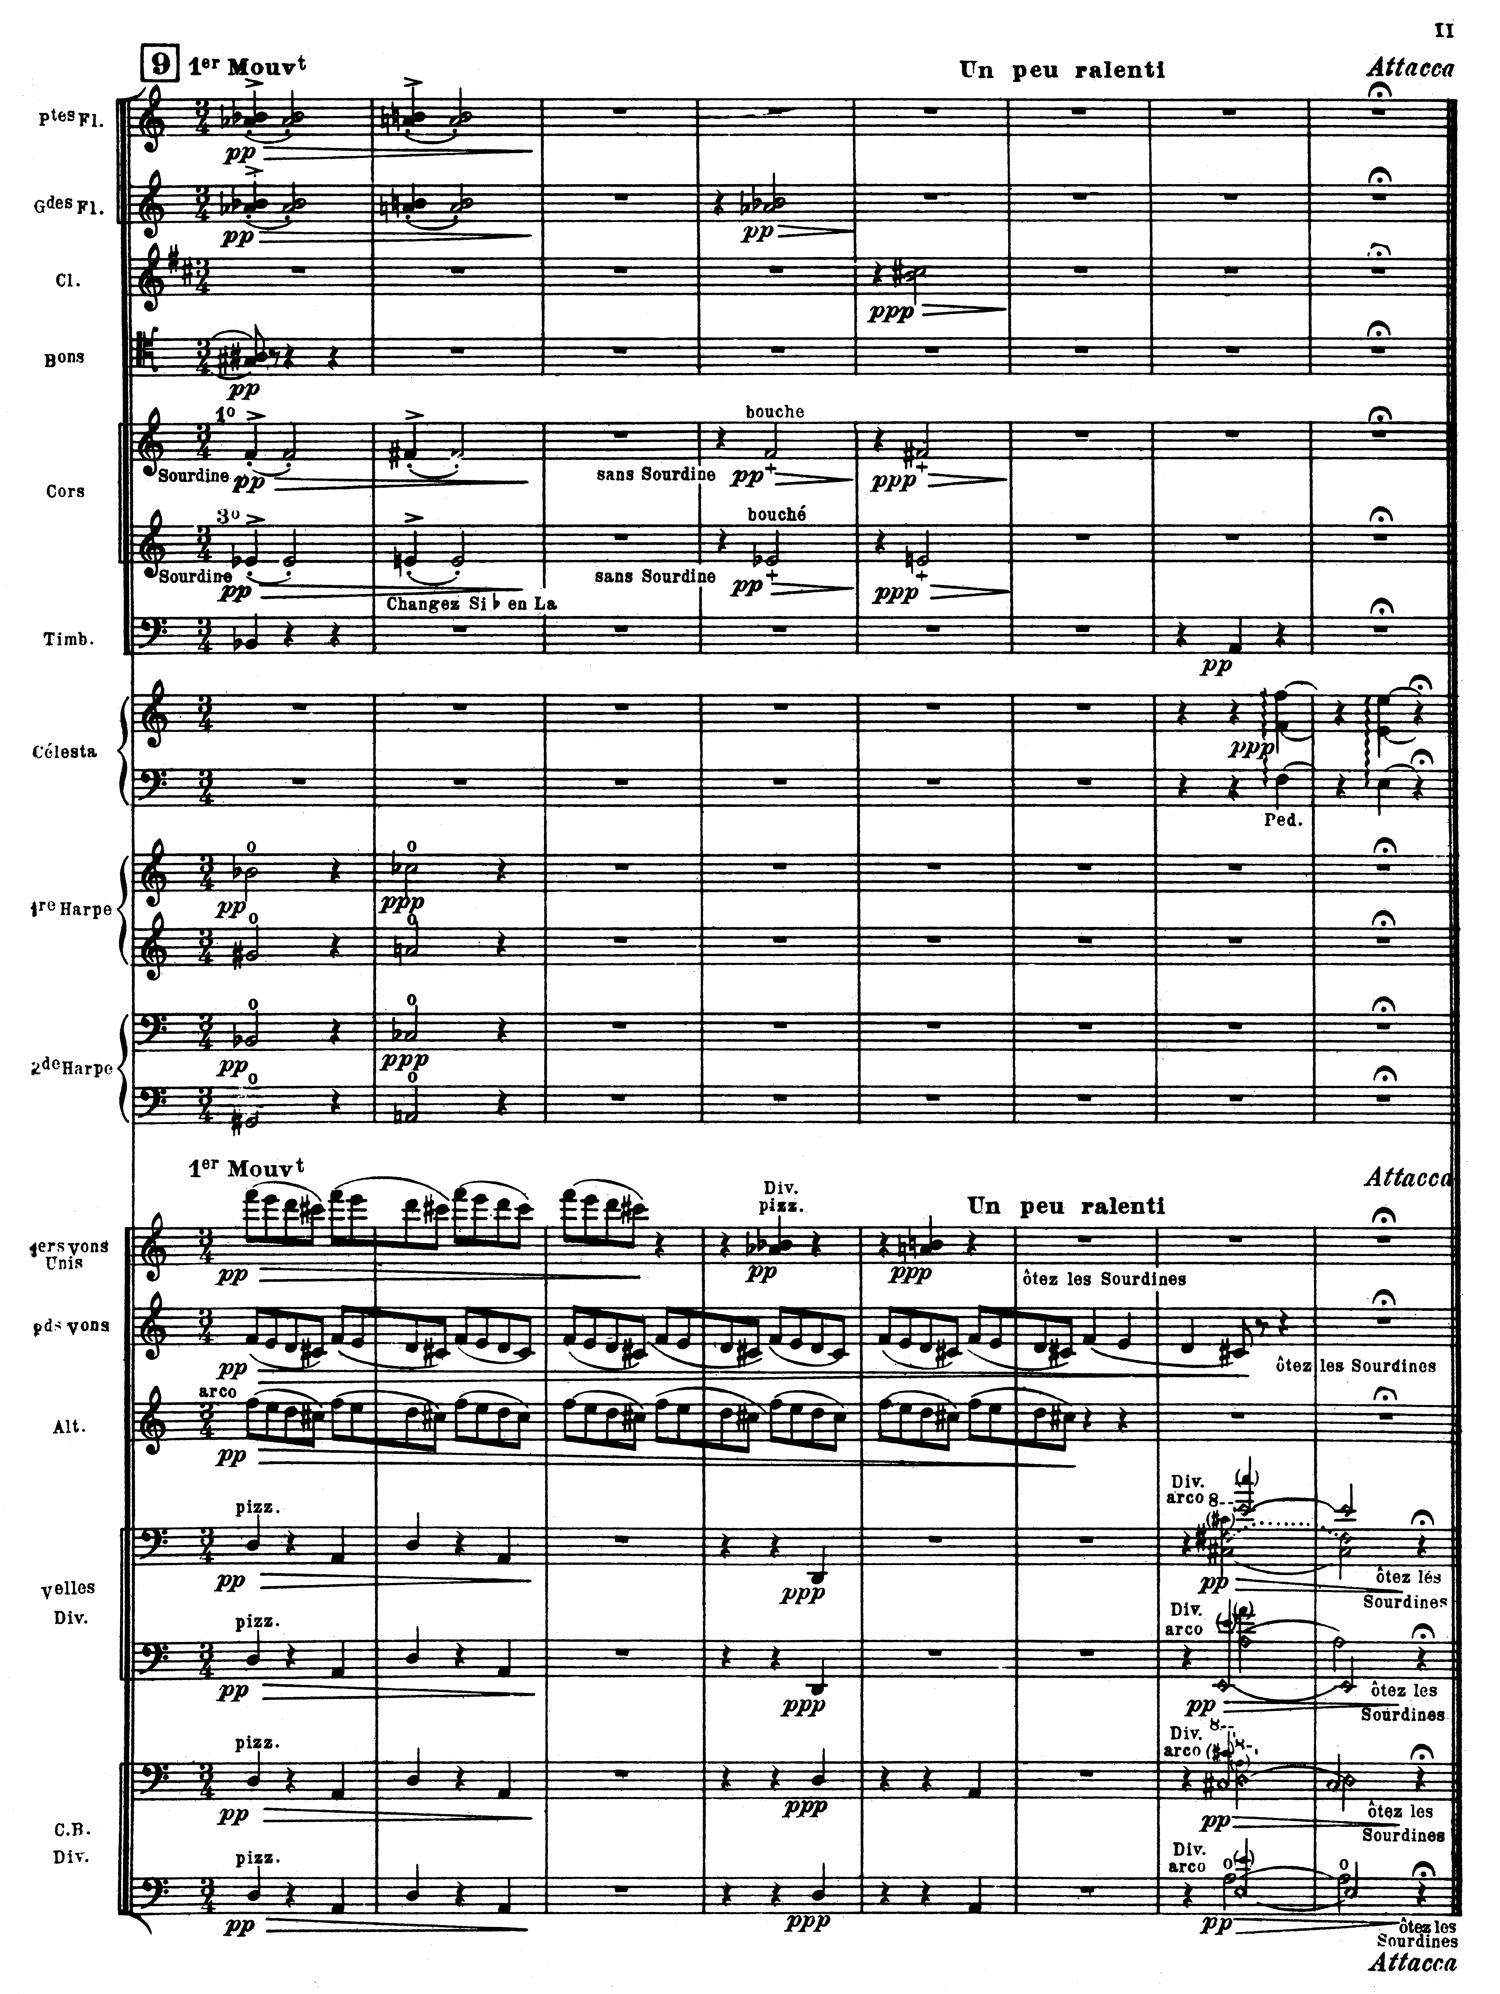 Rapsodie espagnole Score 2.jpg